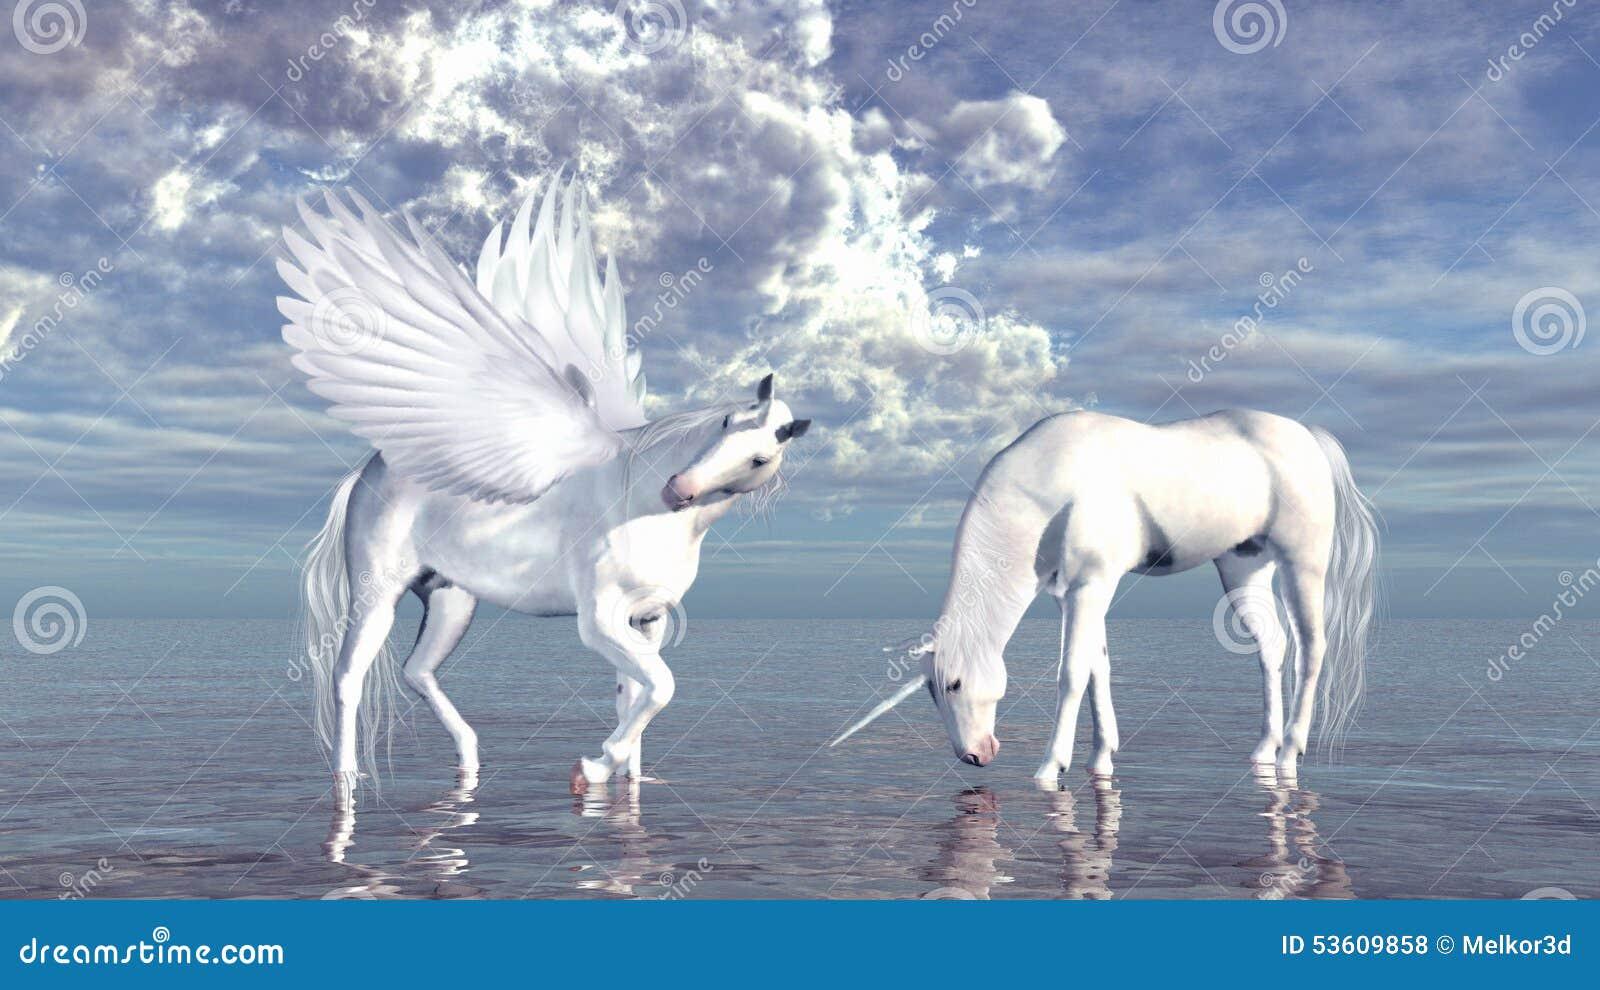 the last unicorn pdf free download